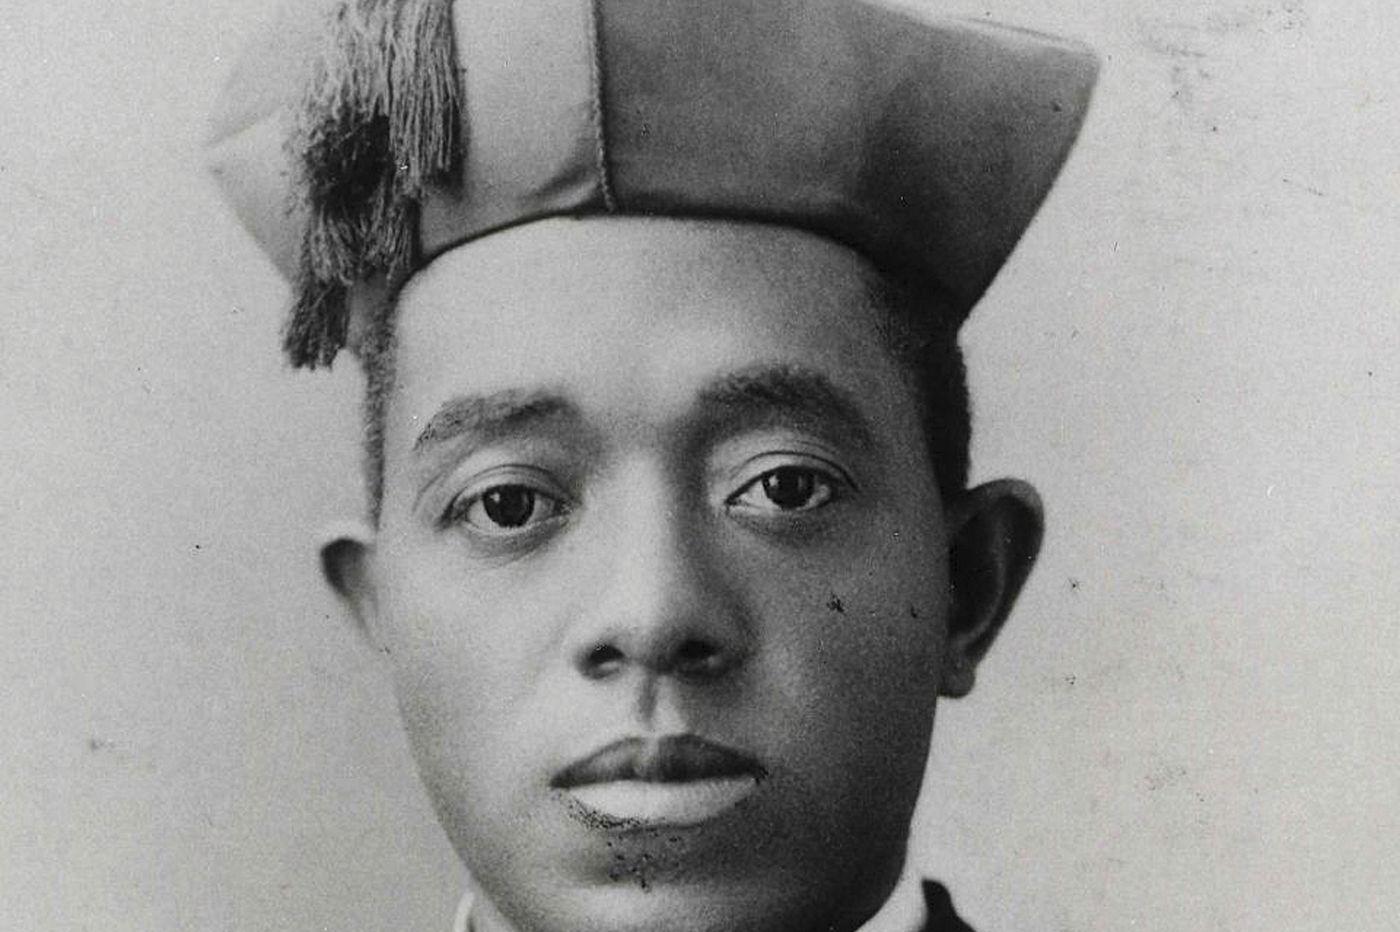 1st black Roman Catholic priest in U.S., a former slave, in line for sainthood